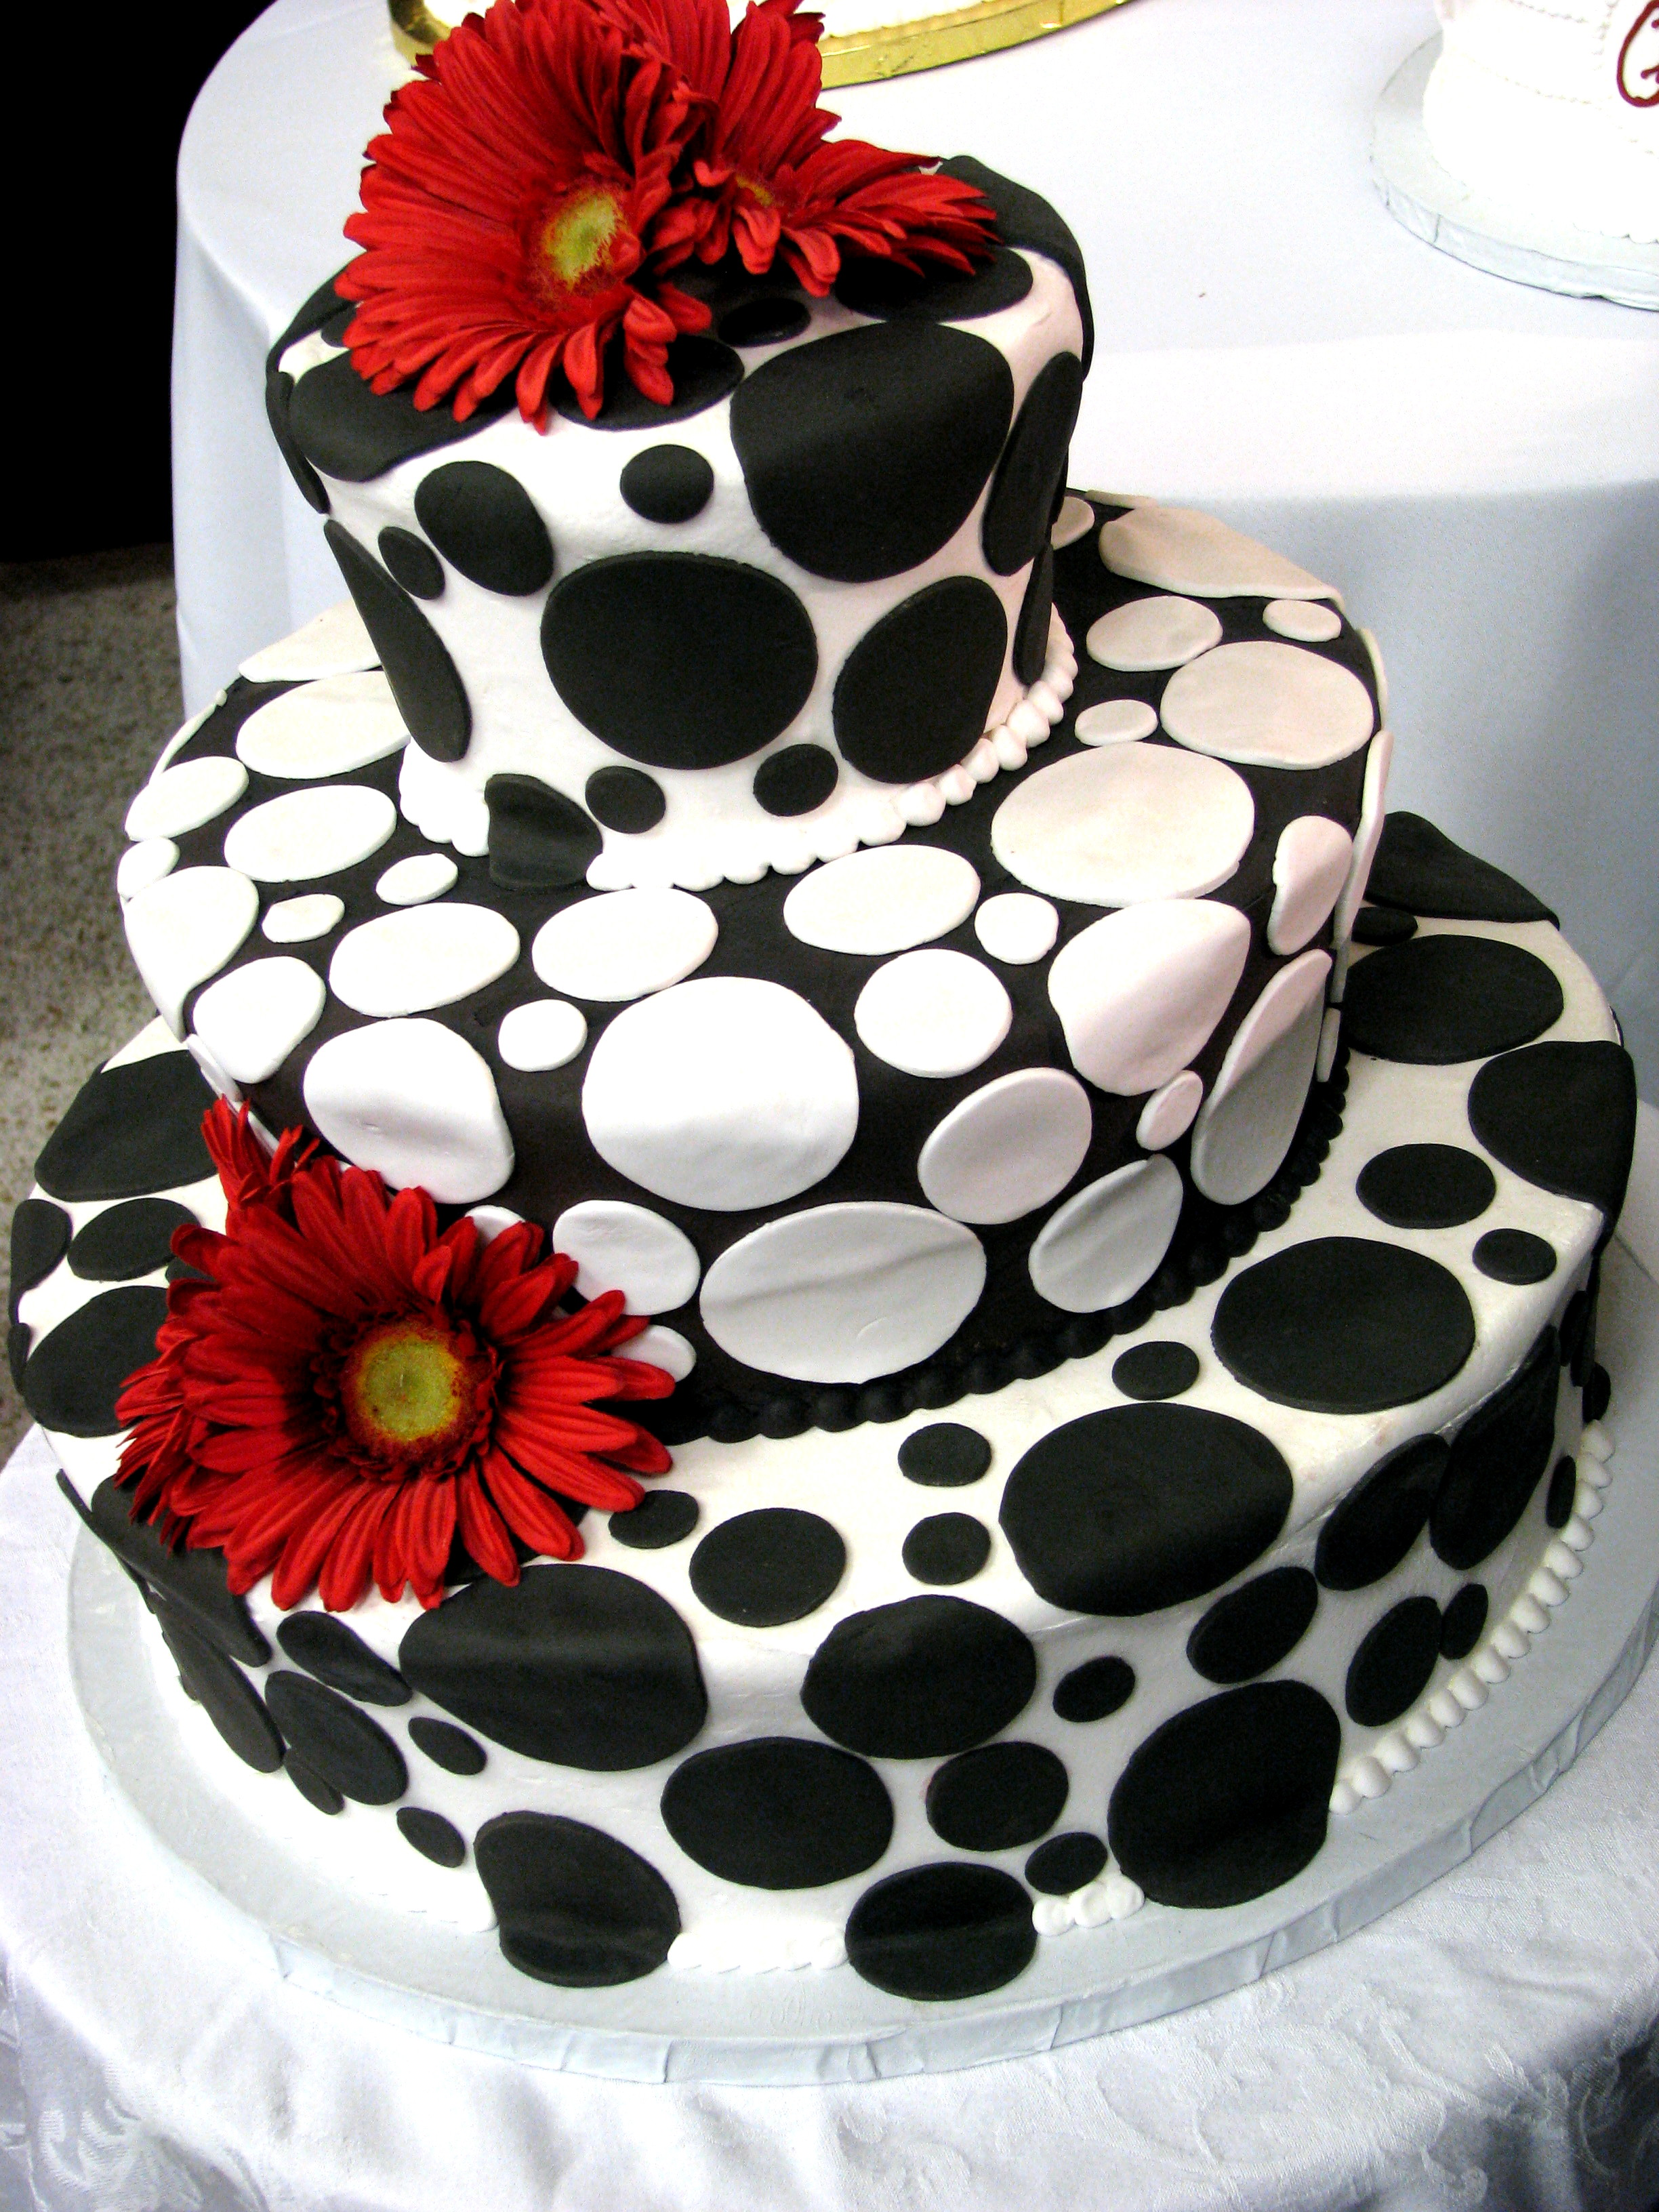 Black & White cake ideas on Pinterest